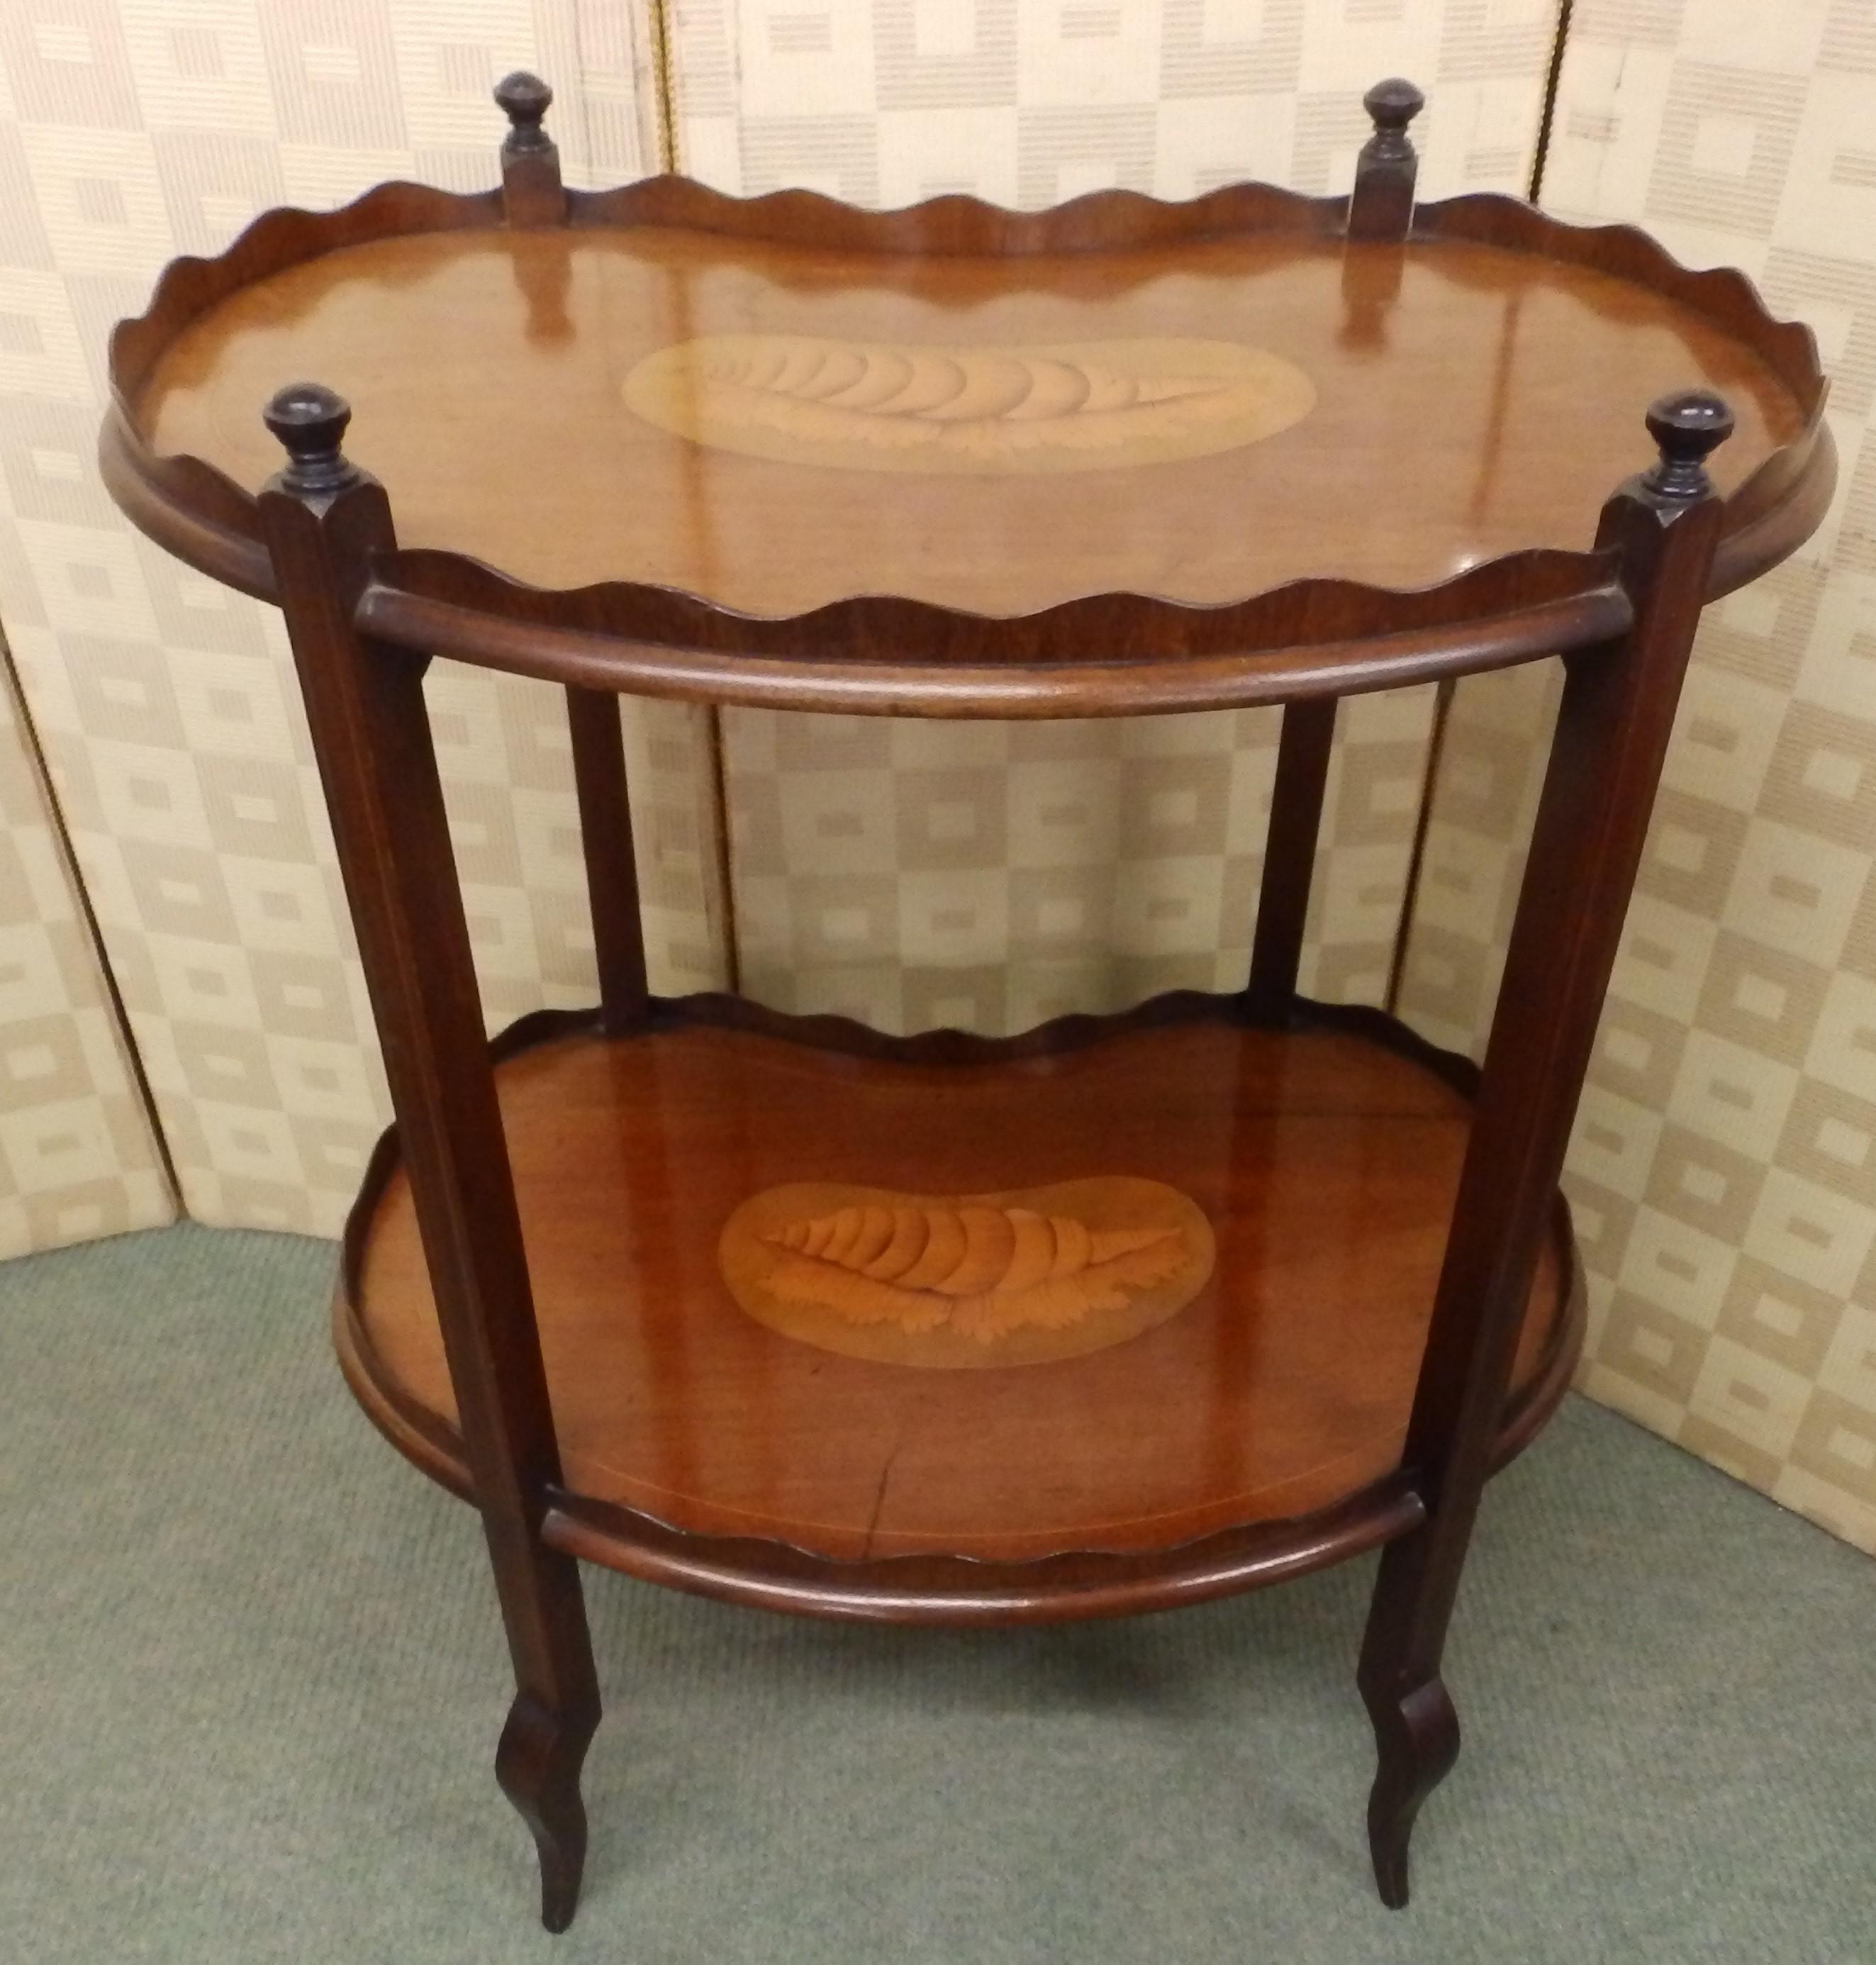 Edwardian table